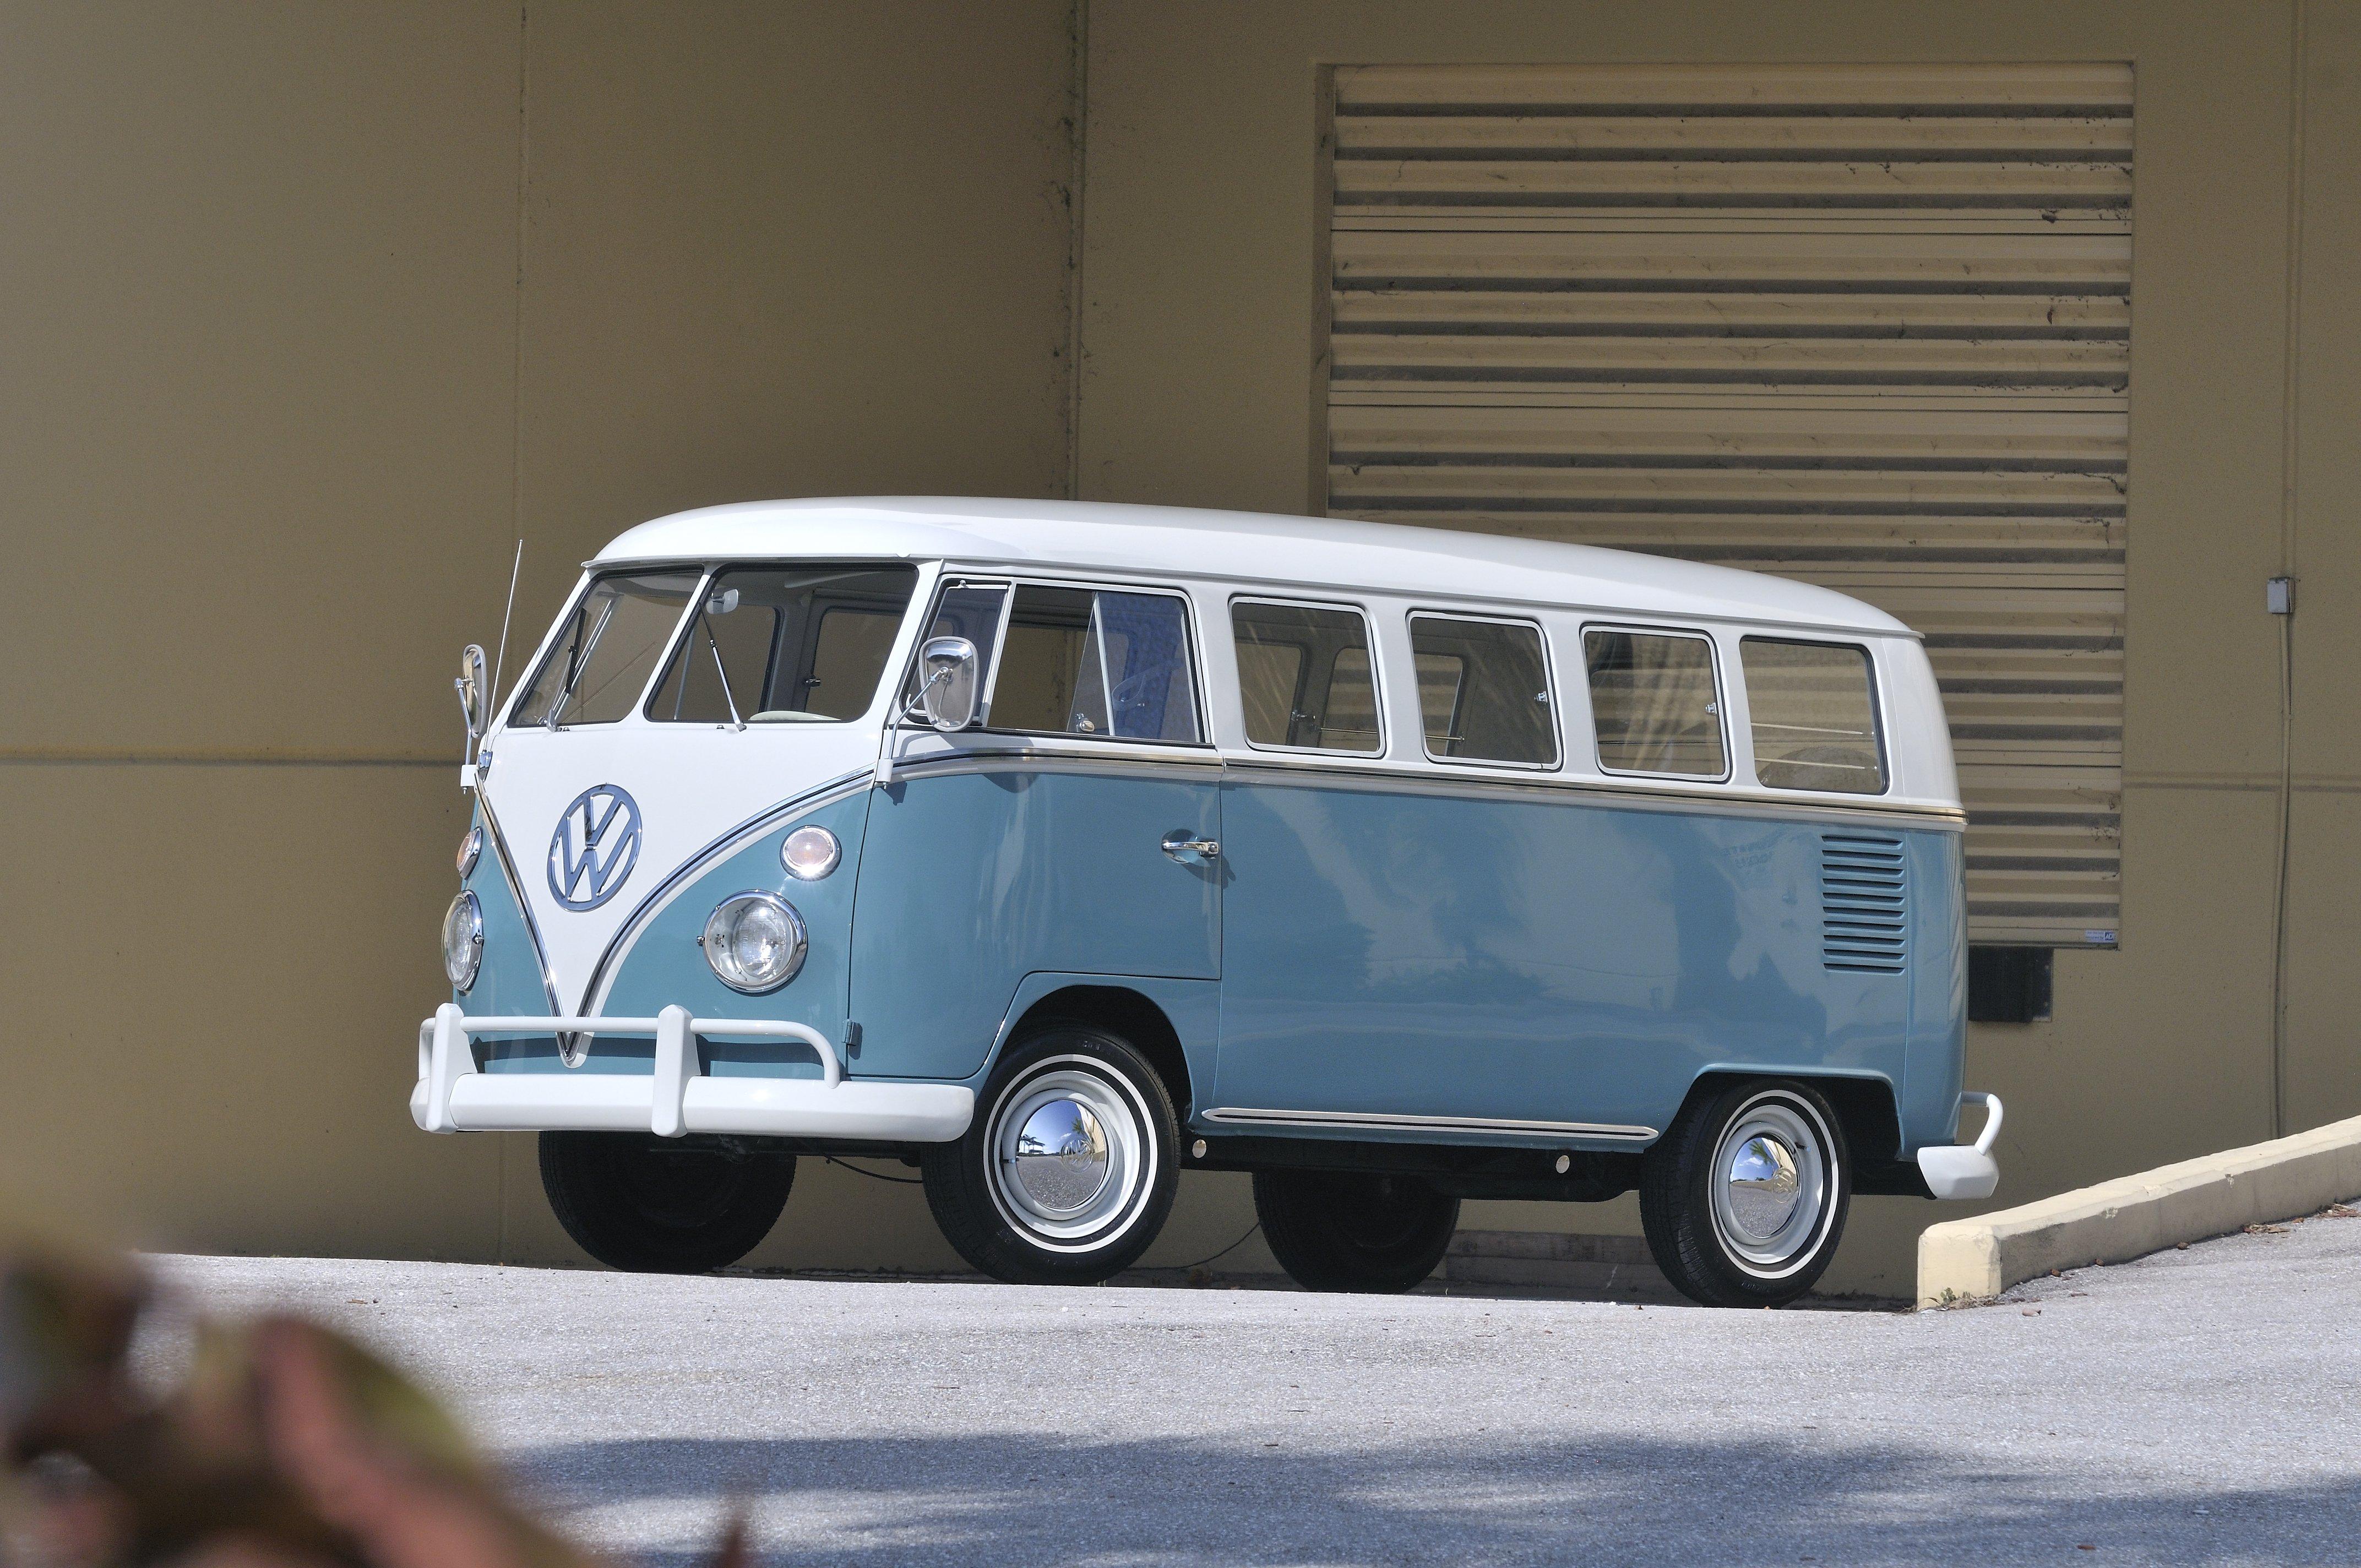 1967 volkswagen vw 13 window bus kombi classic old usa for 13 window vw bus